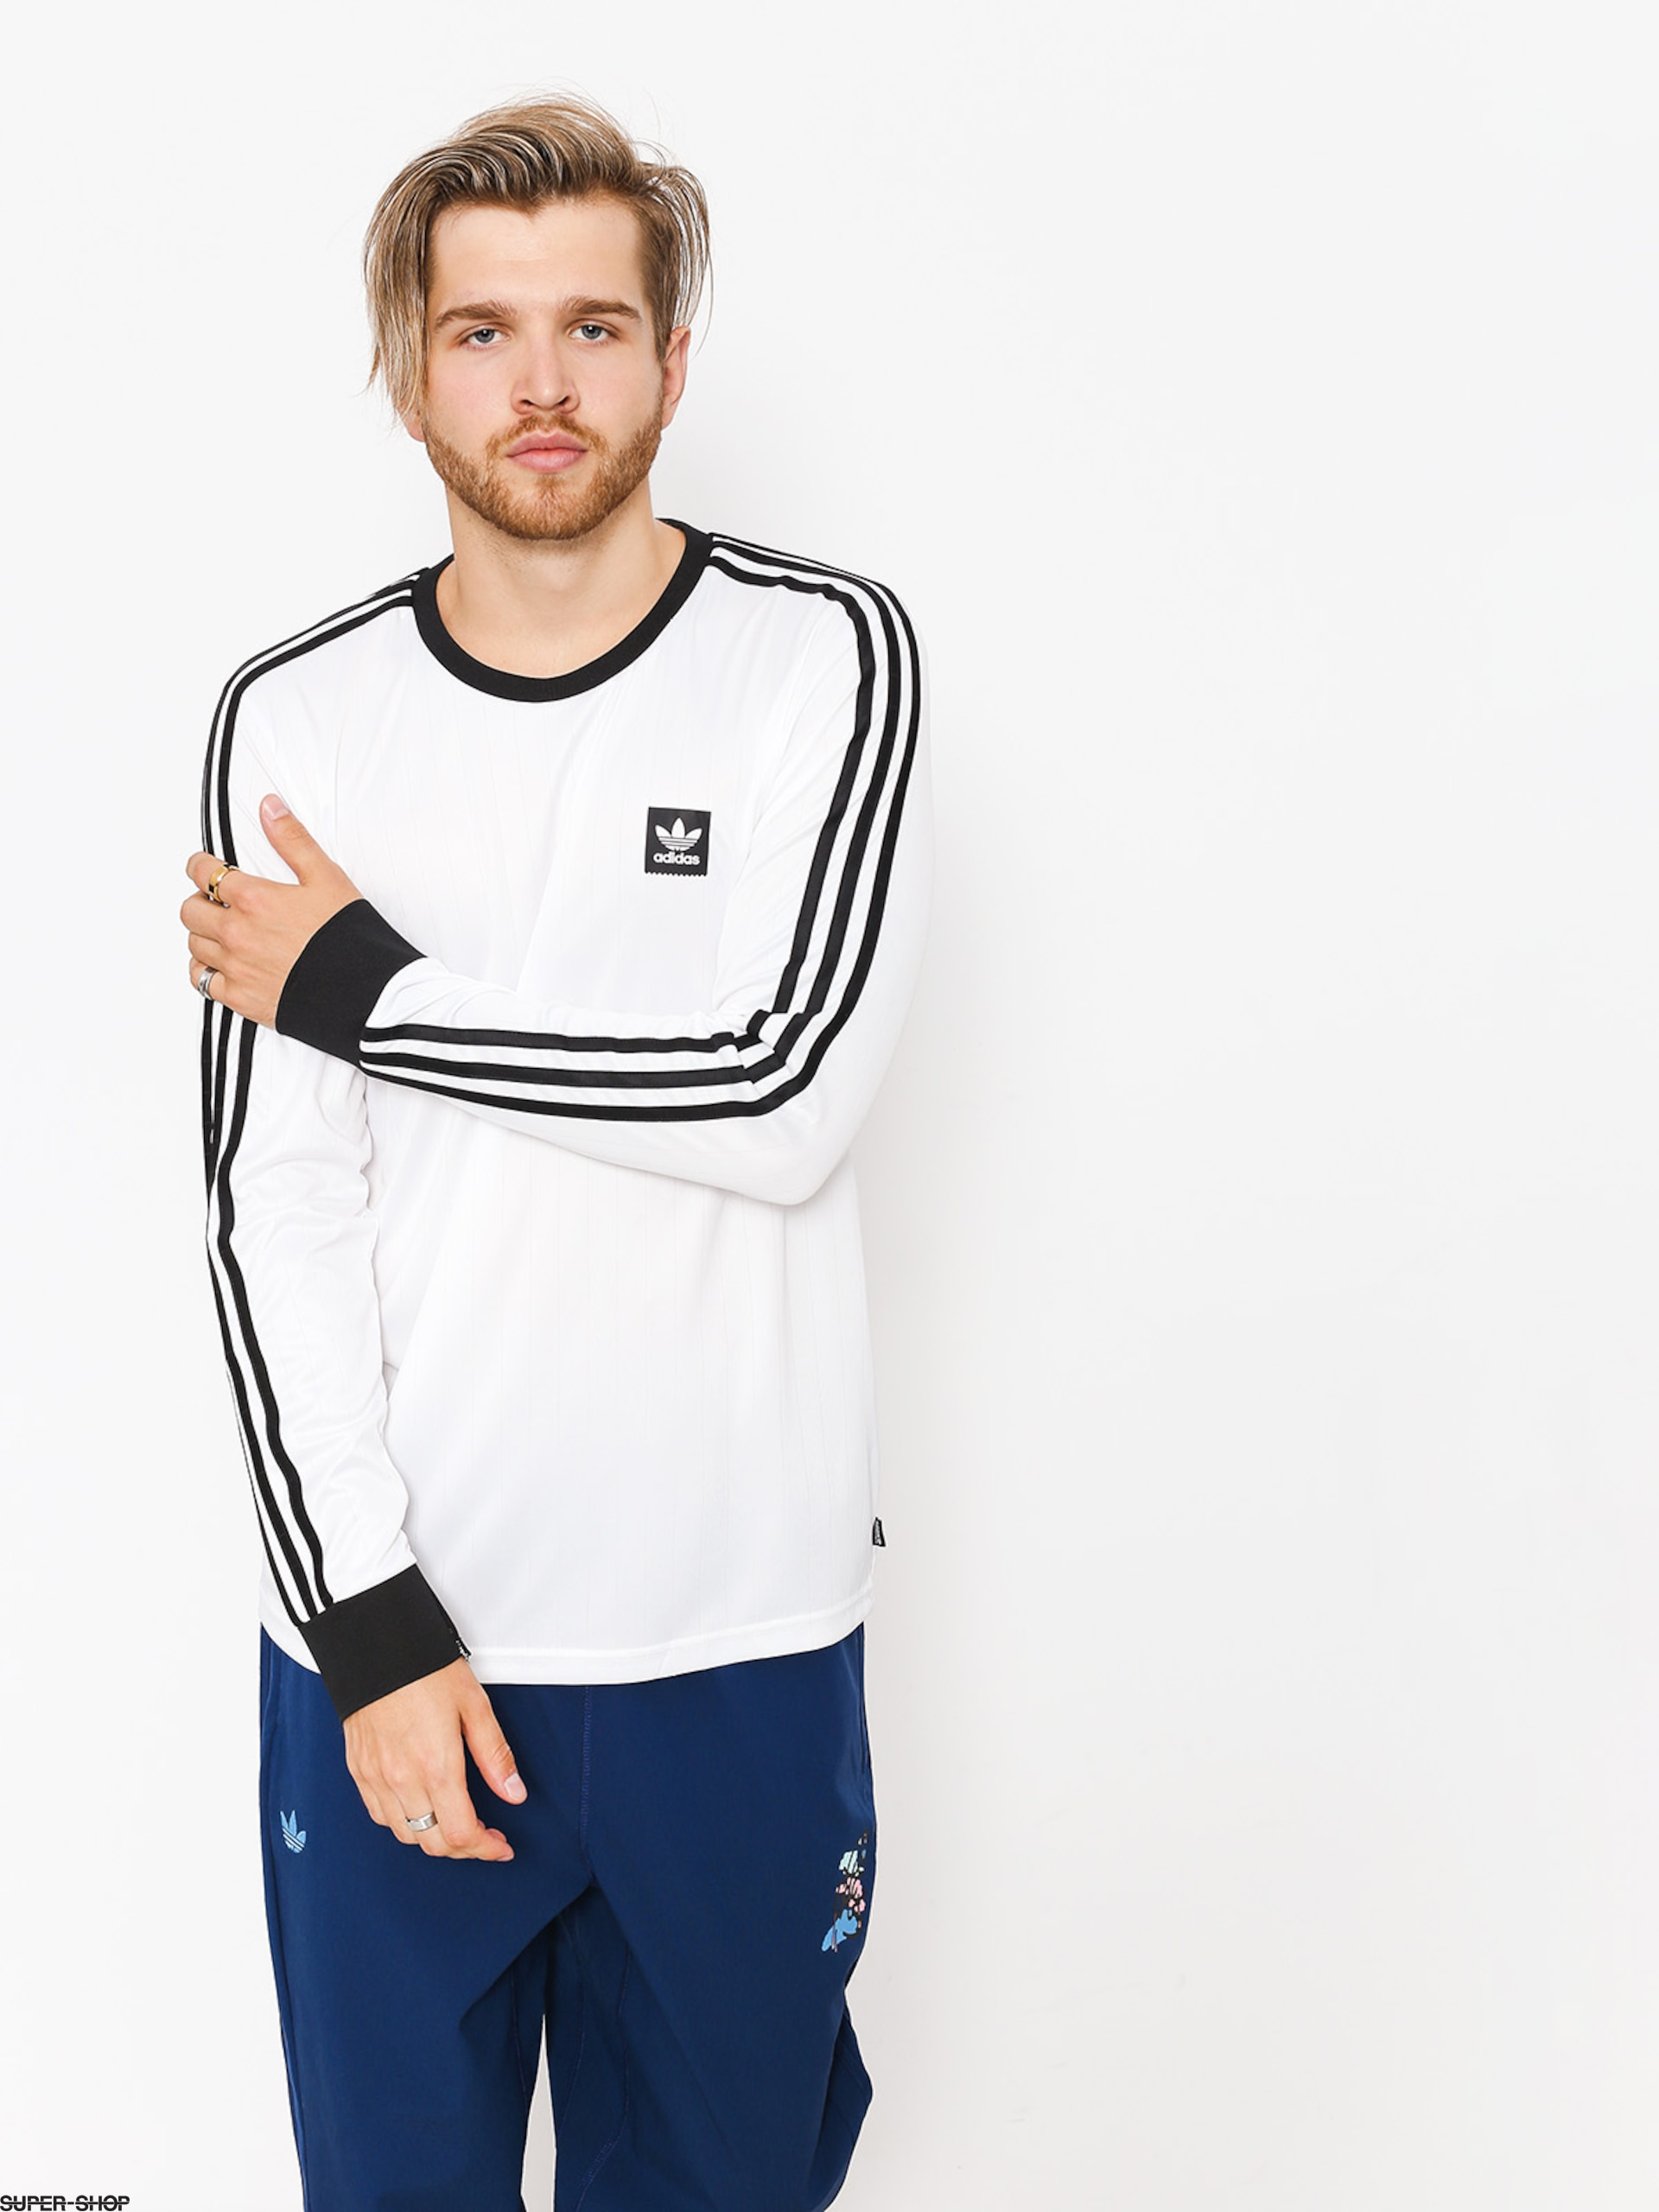 962982-w1920-adidas-longsleeve-club-jersey-white-black.jpg 01f0beb63